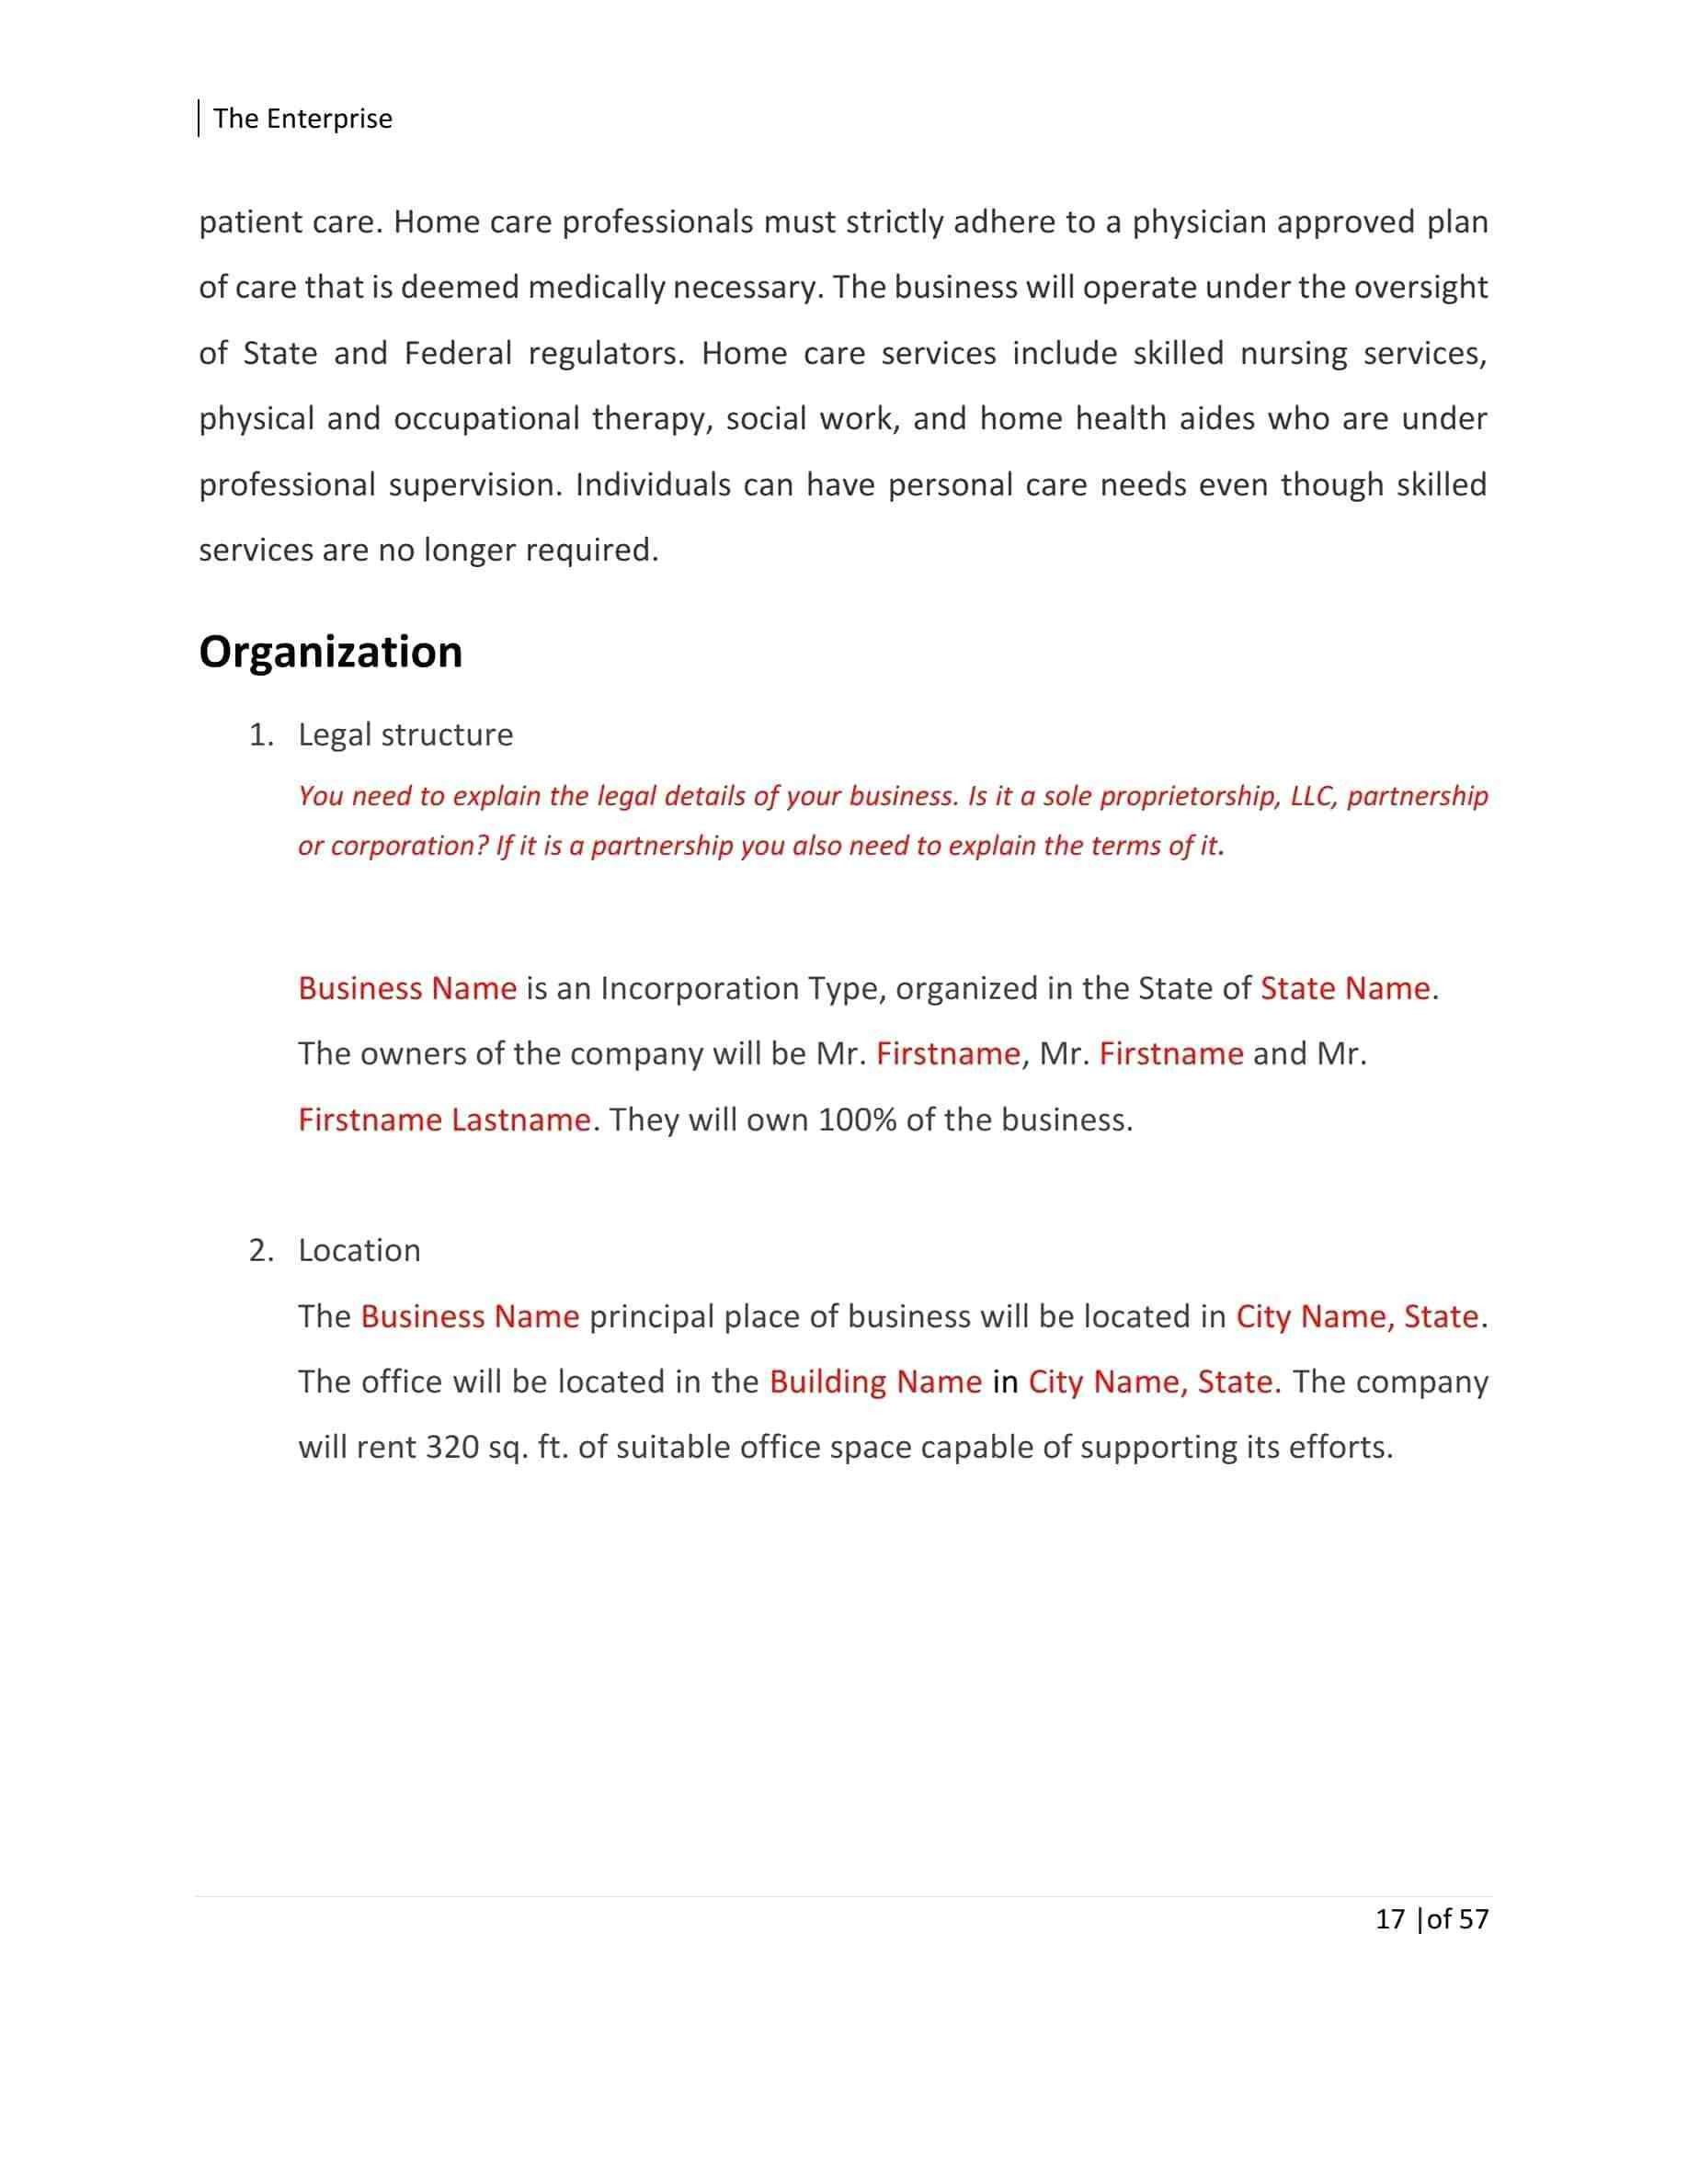 New Sole Proprietorship Business Plan Template